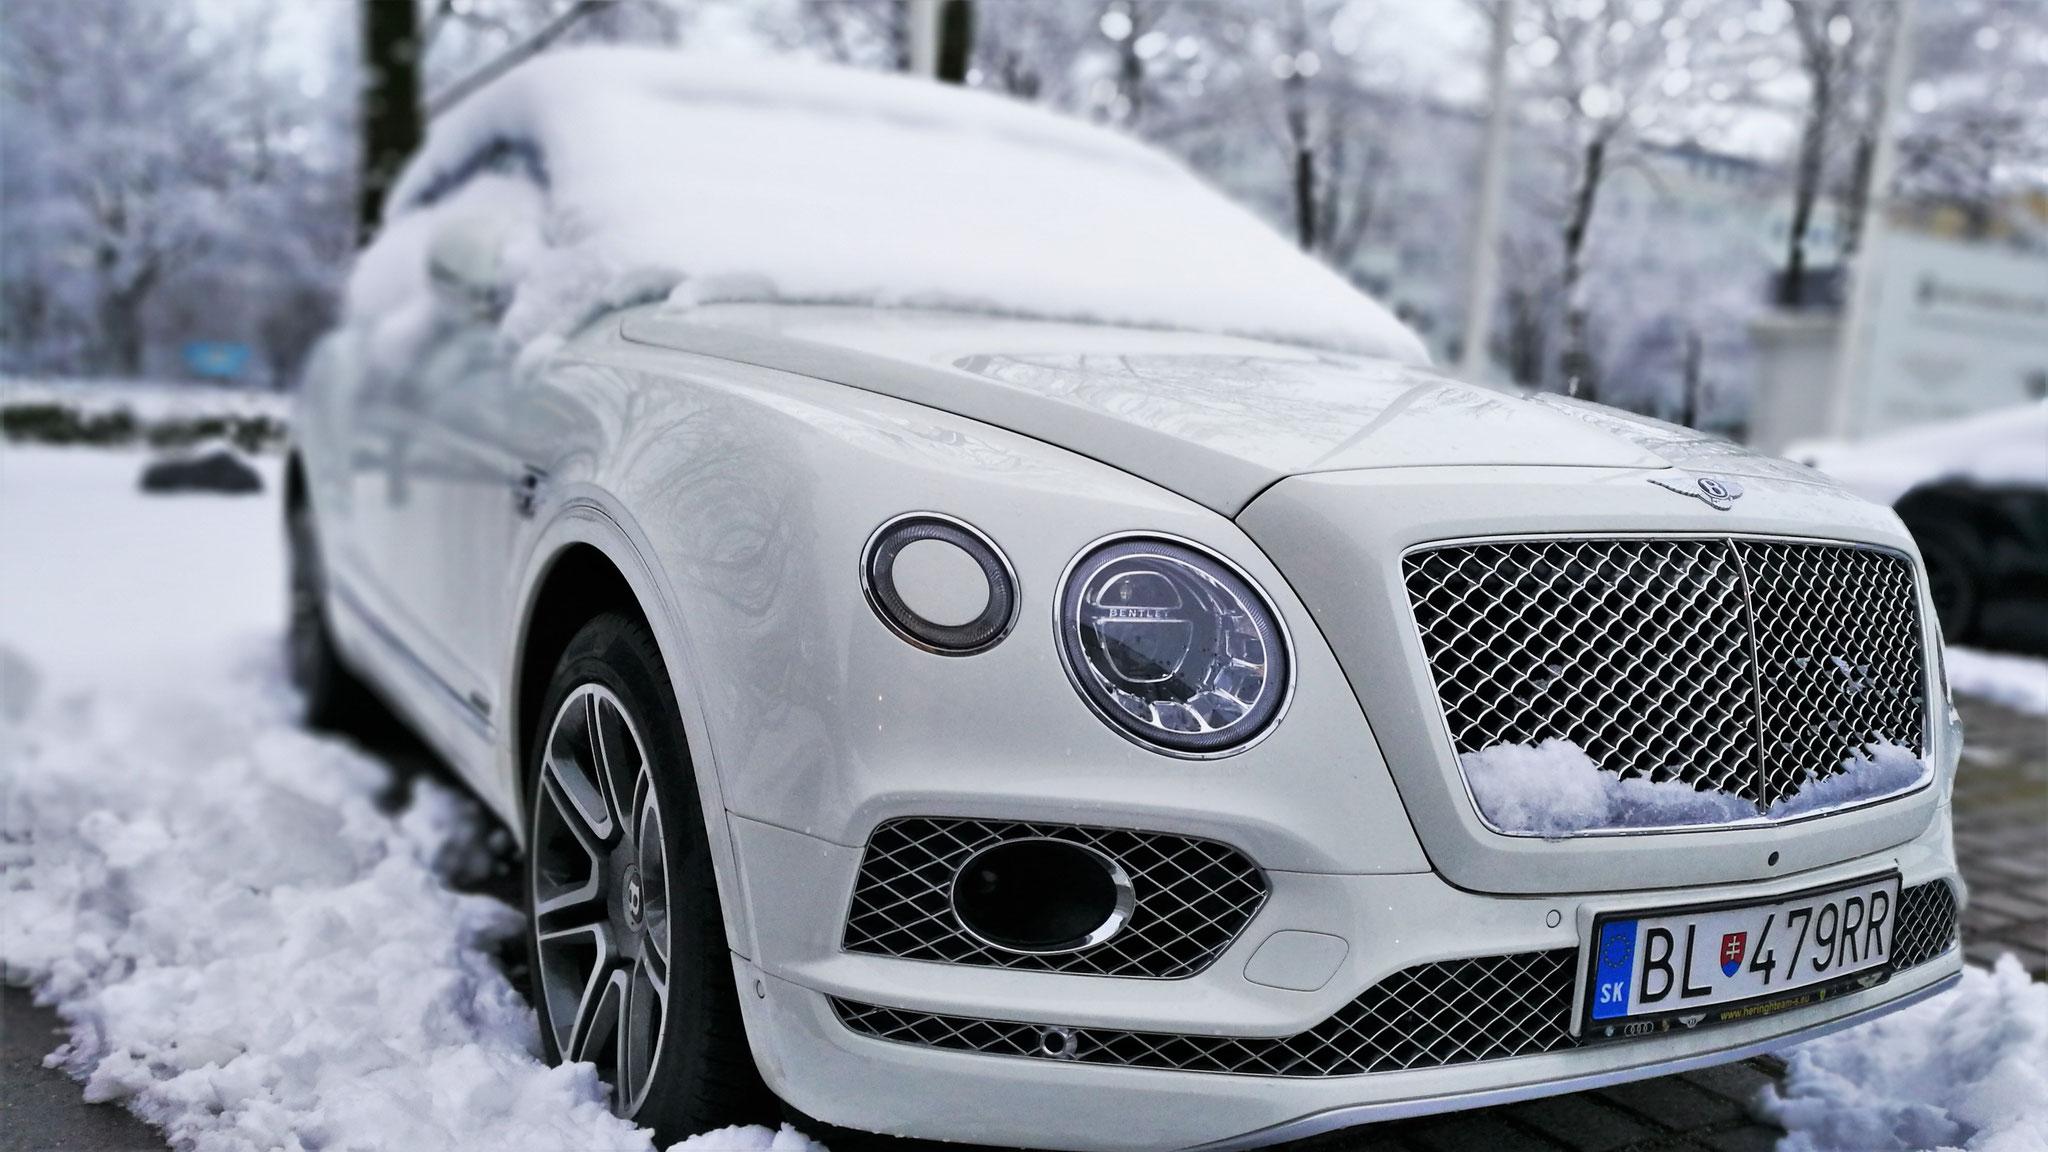 Bentley Bentayga - BL-479RR (SK)